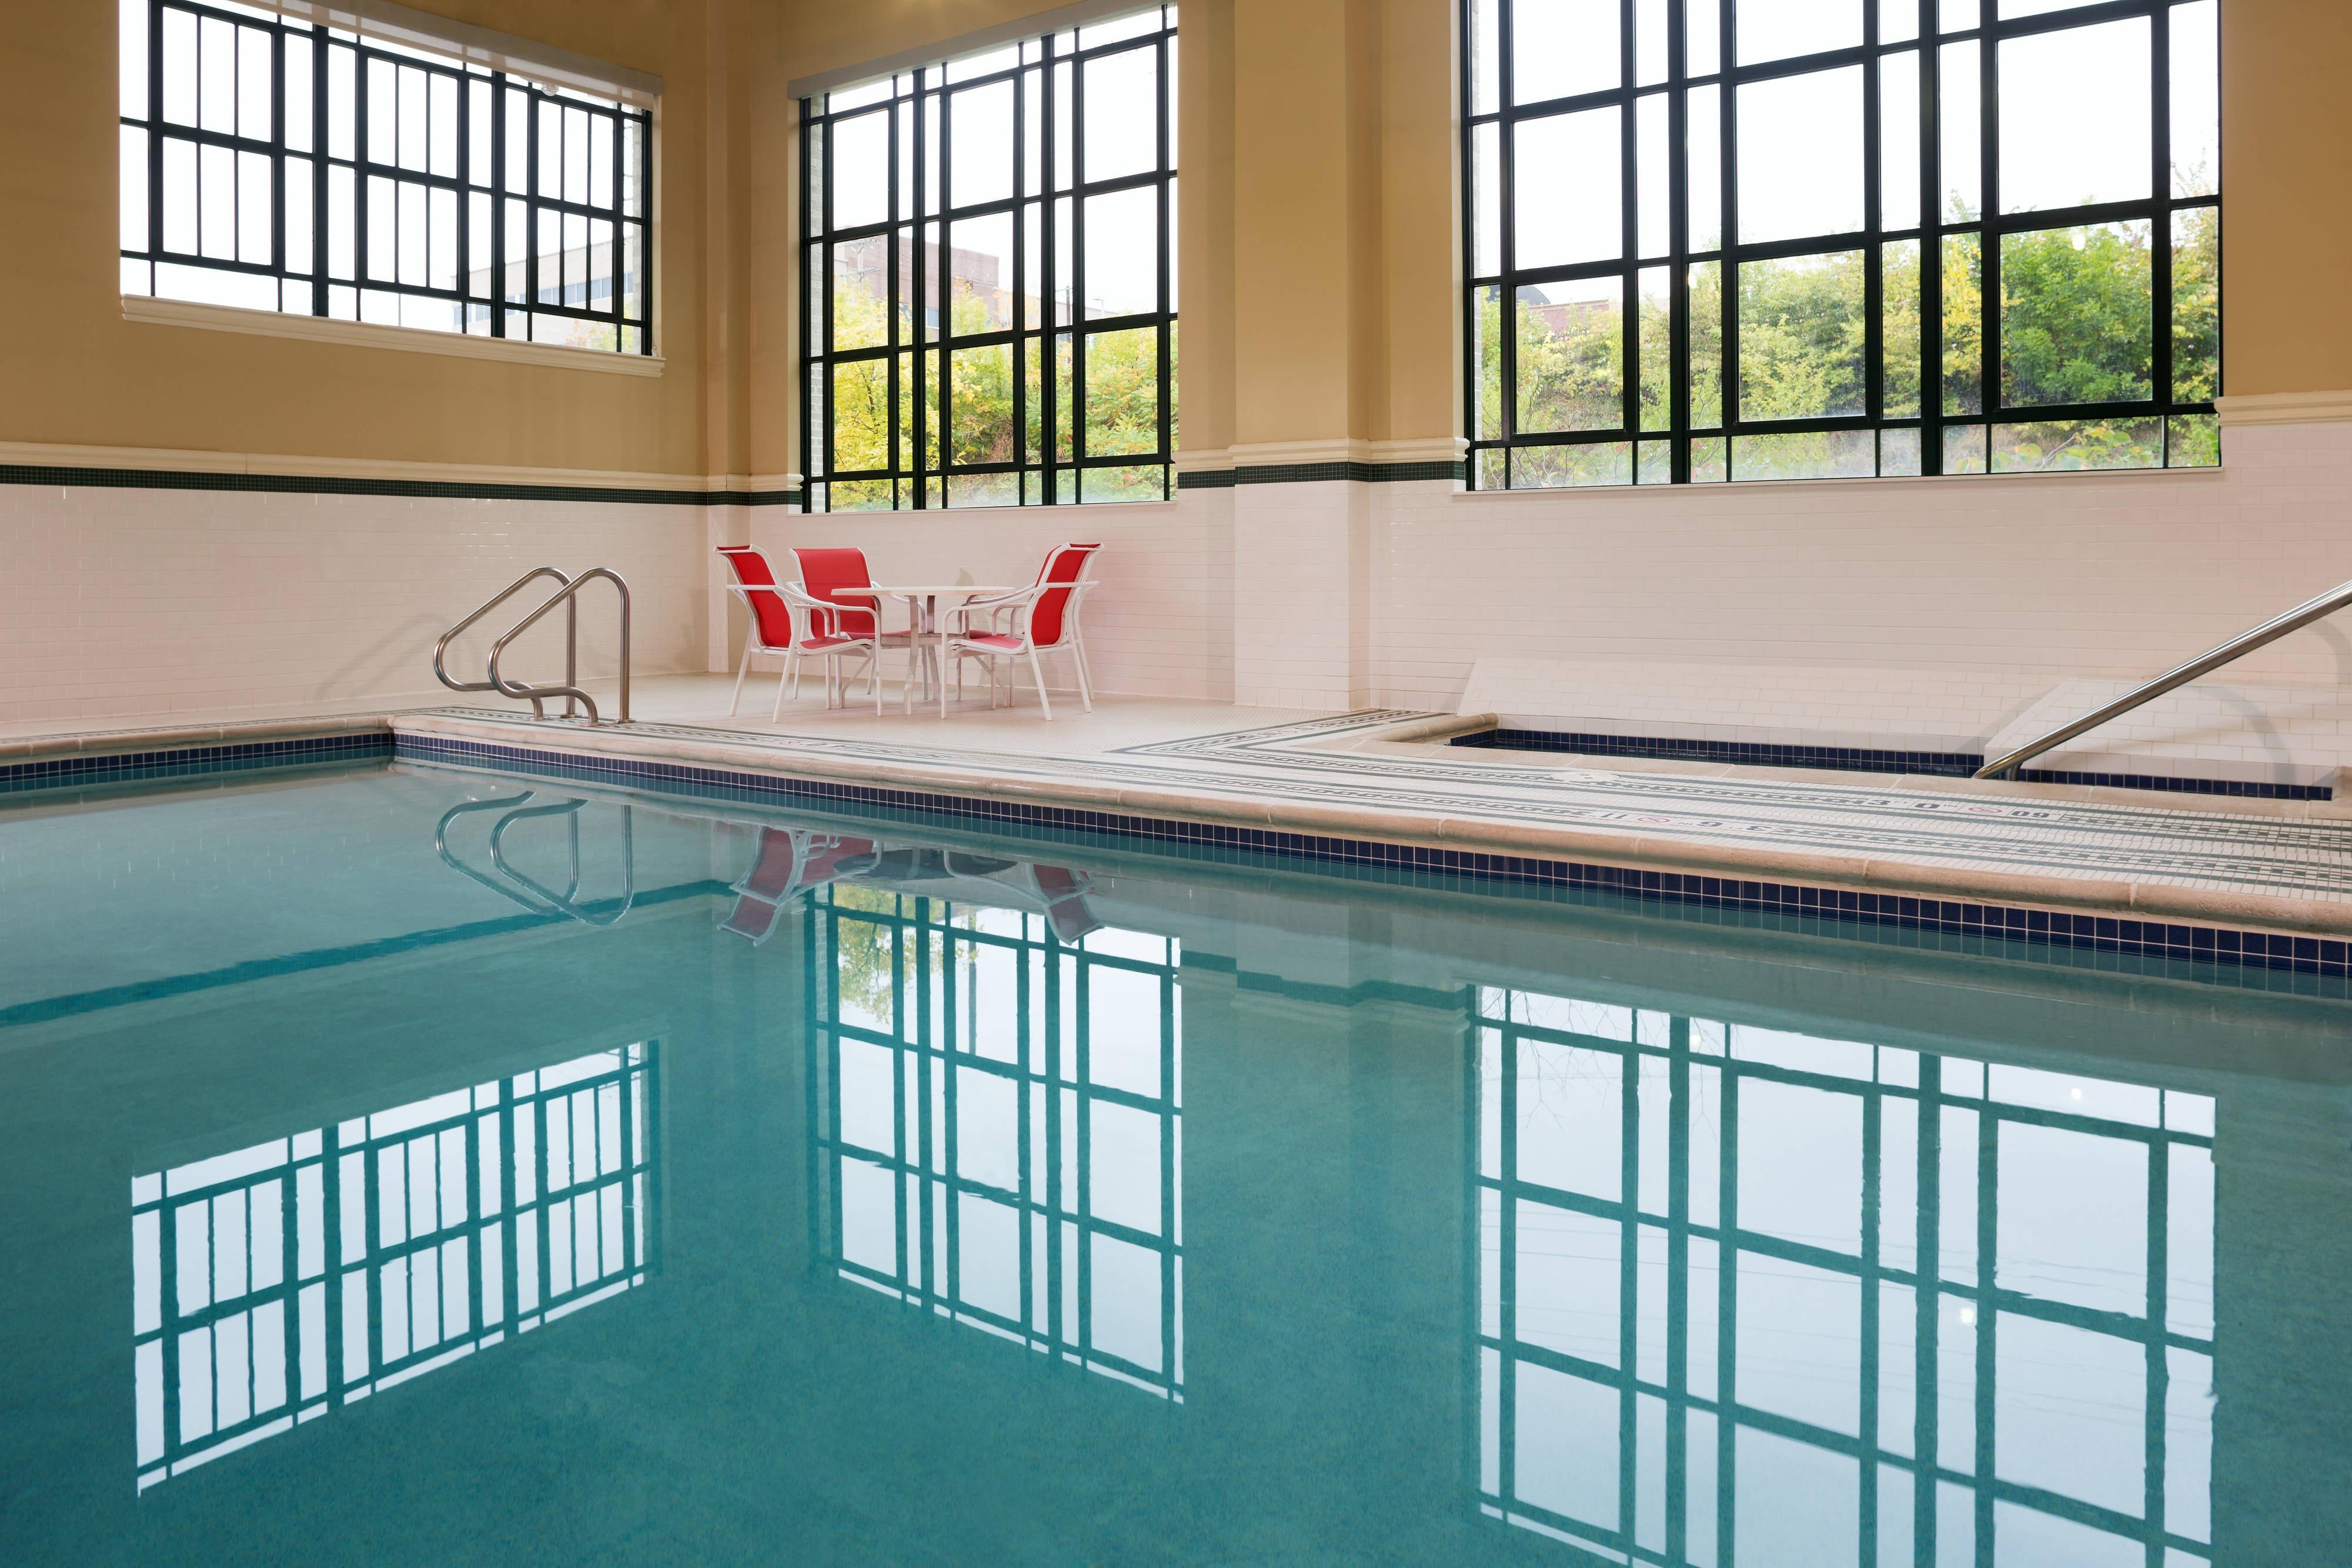 Pool - WhirlPool